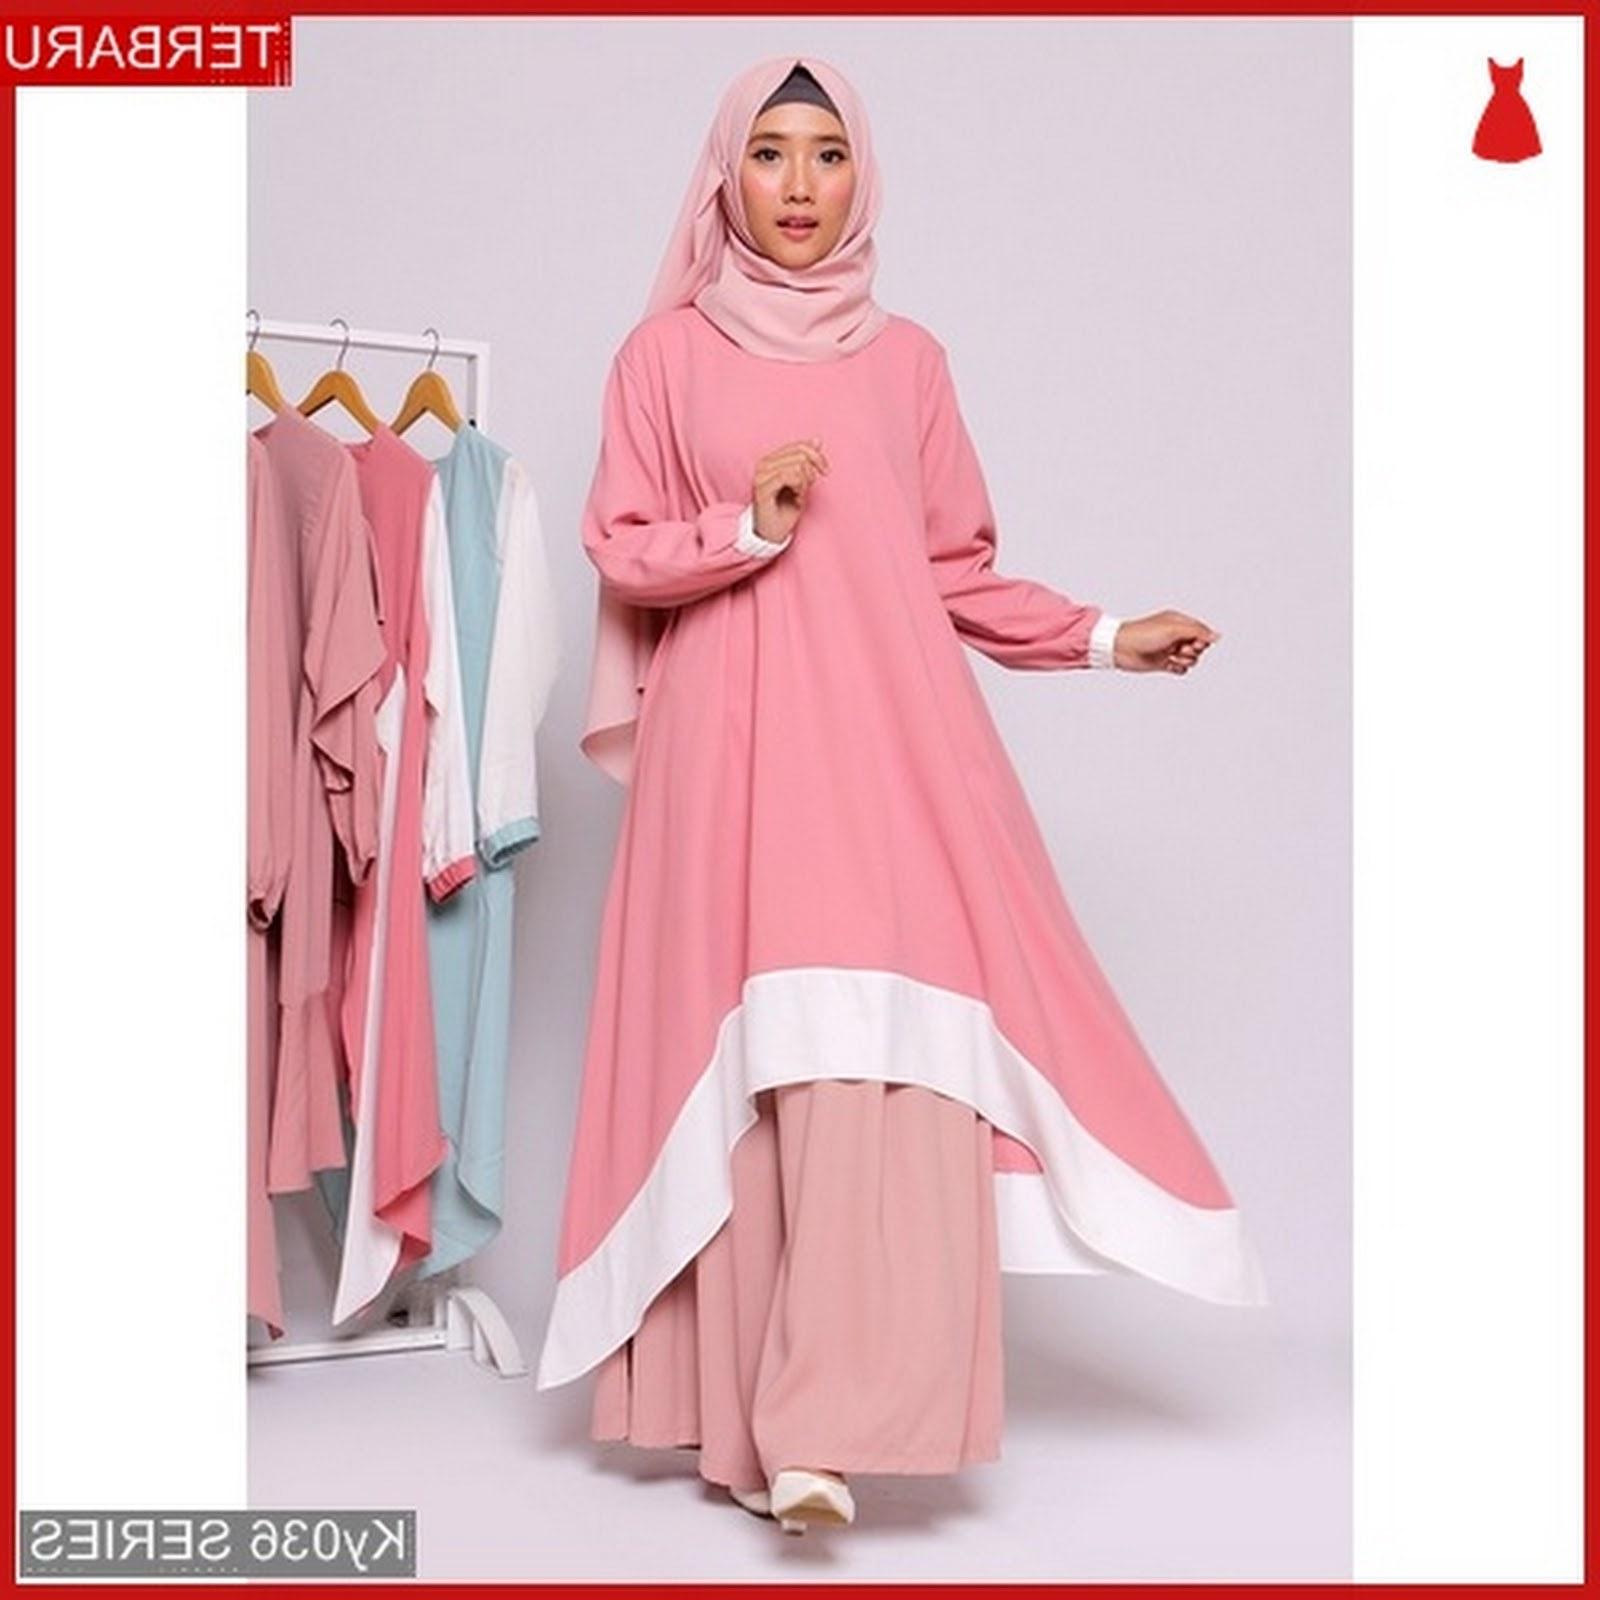 Bentuk Harga Baju Lebaran 87dx Dapatkan Baju Muslim Lebaran Paling Keren Terbaru Di Bmg